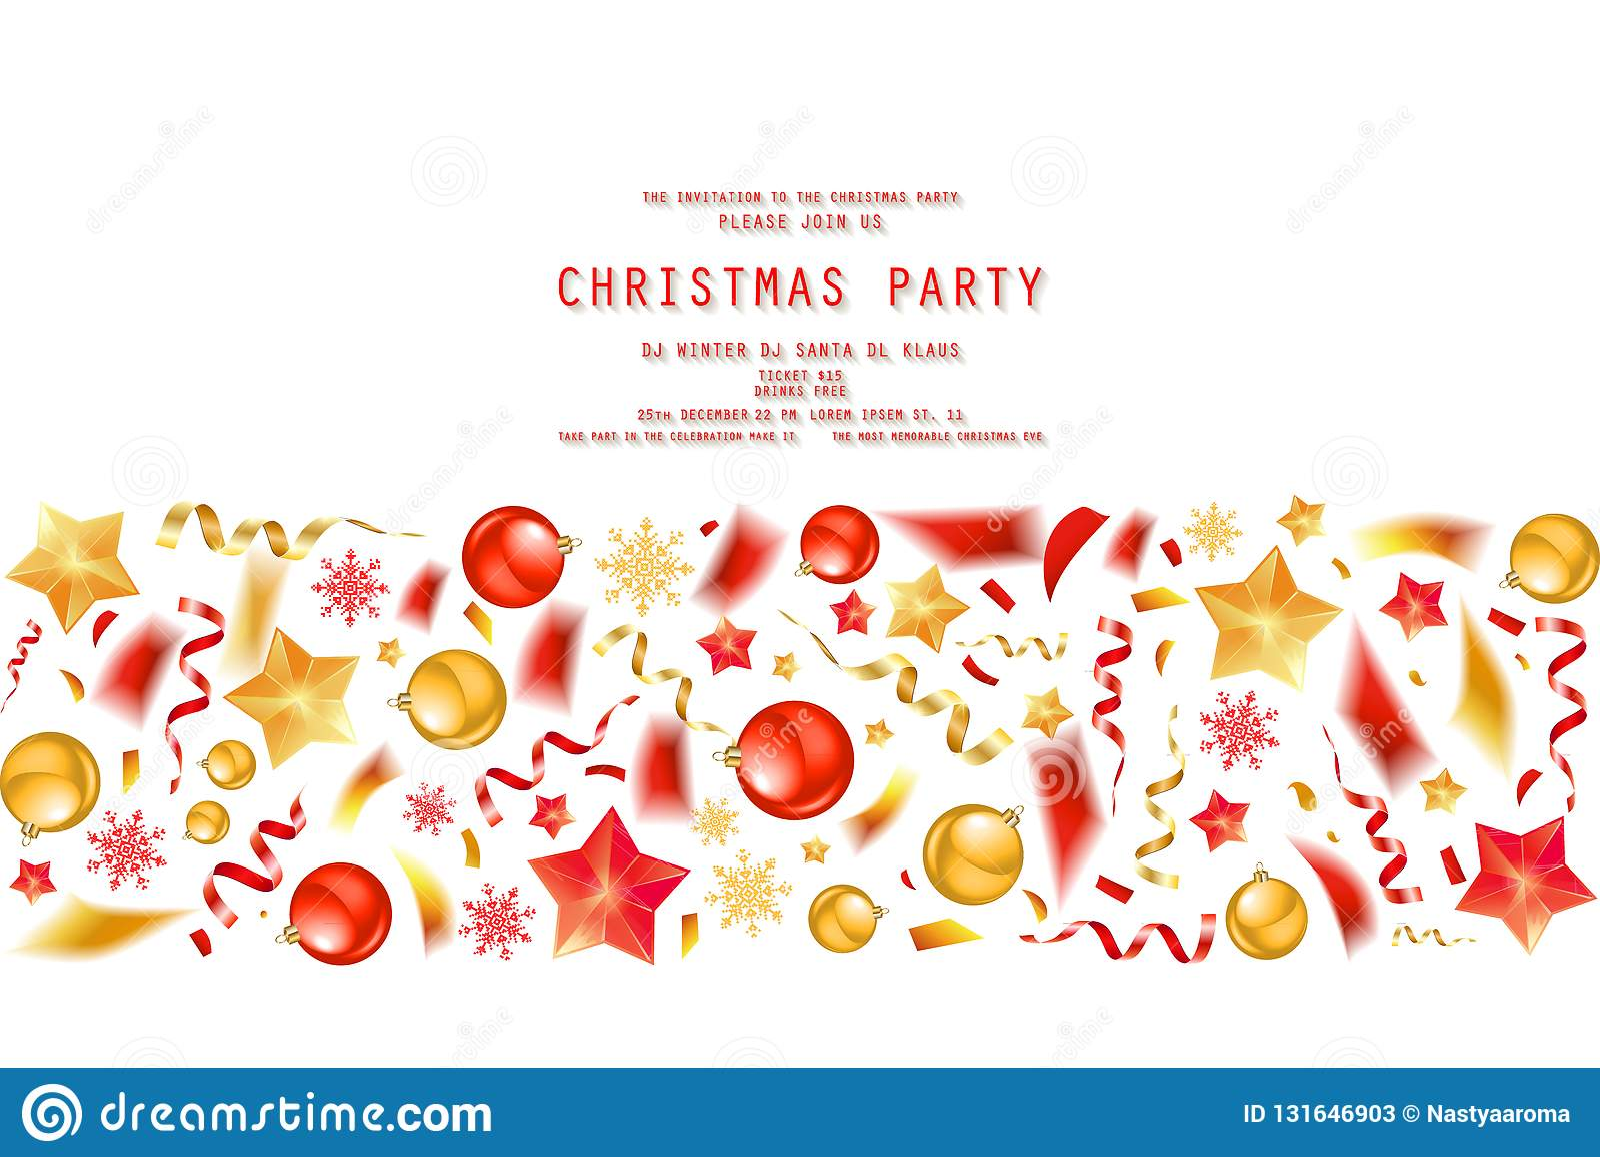 Christmas Party Or Dinner Invitation Stock Illustration